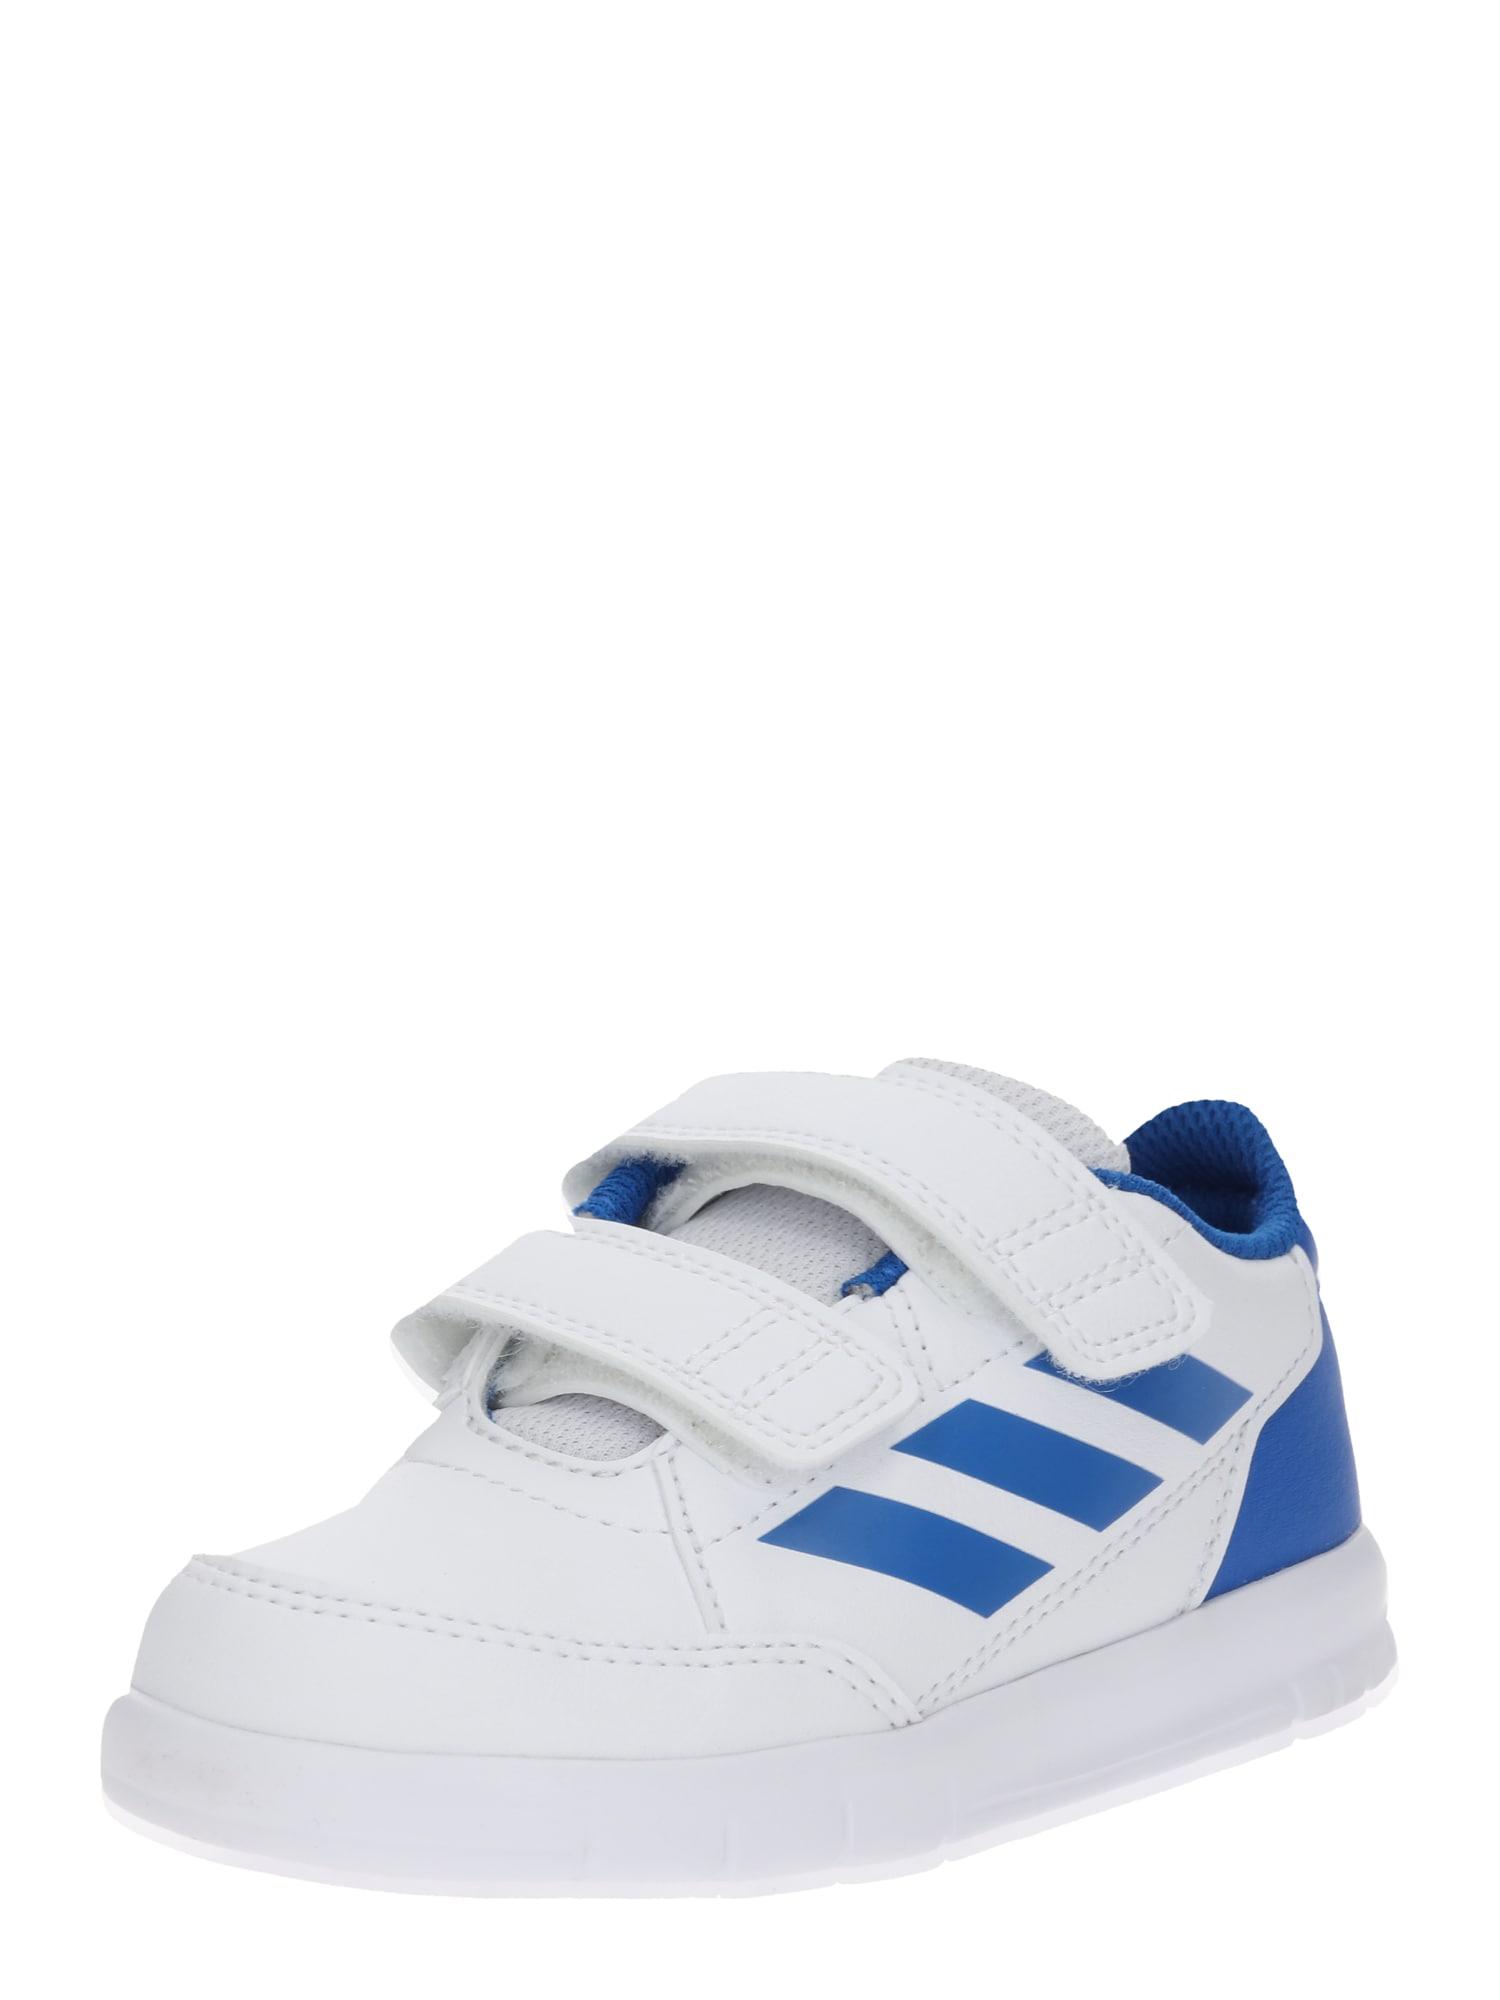 Sportovní boty AltaSport CF I modrá bílá ADIDAS PERFORMANCE